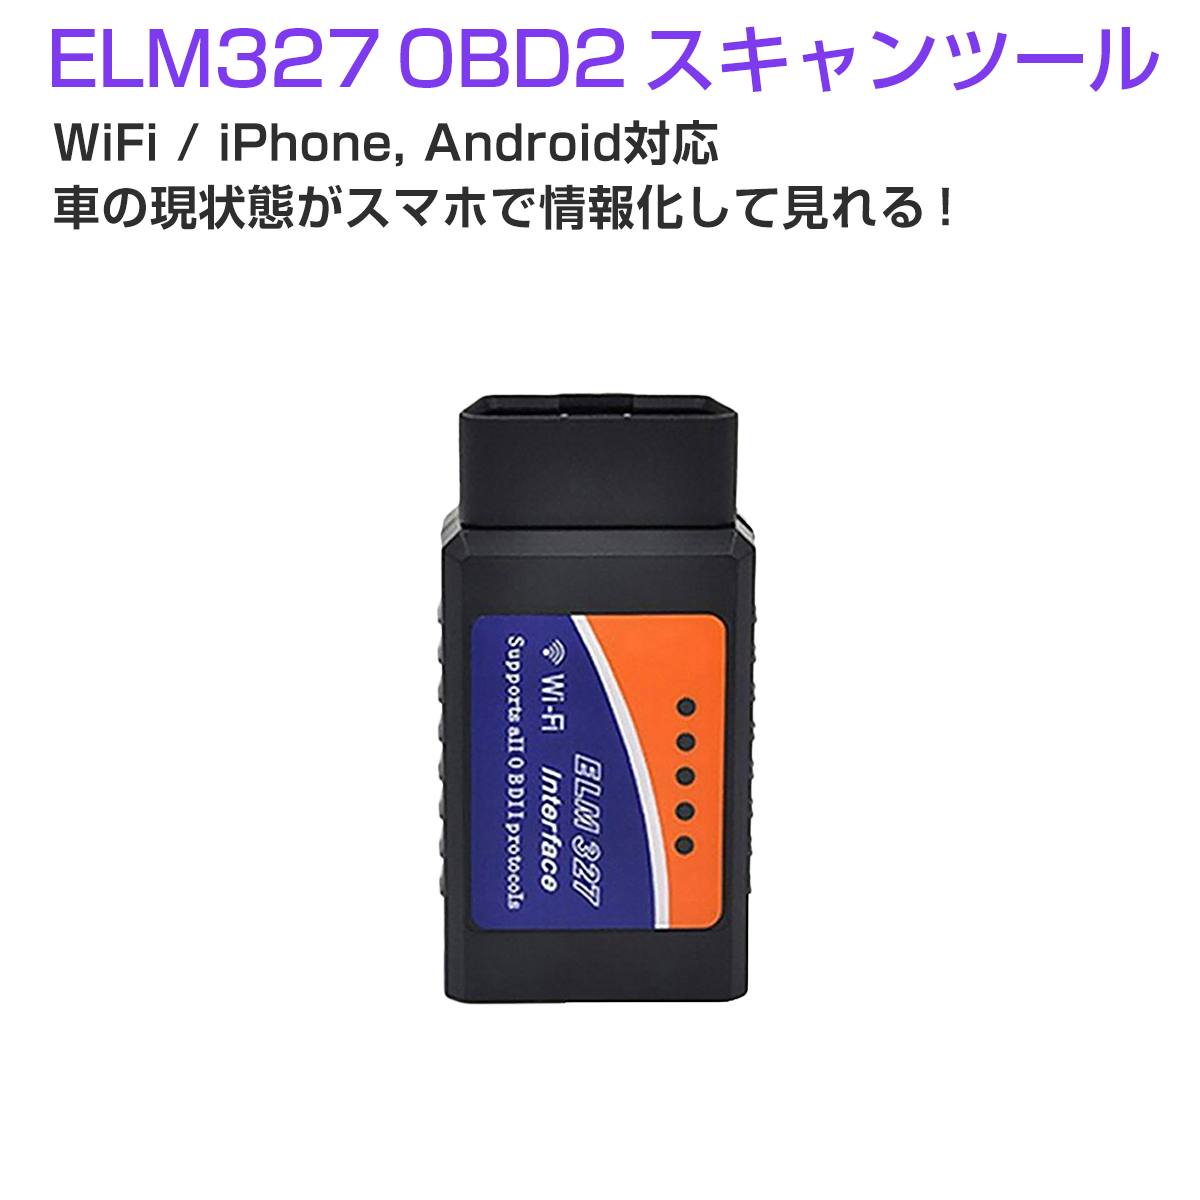 ELM327 WiFi OBD2汎用スキャンツール V1.5 iPhone iPad Android PC対応 カー情報診断ツール OBDII マルチメーター SDM便送料無料 1ヶ月保証 K&M